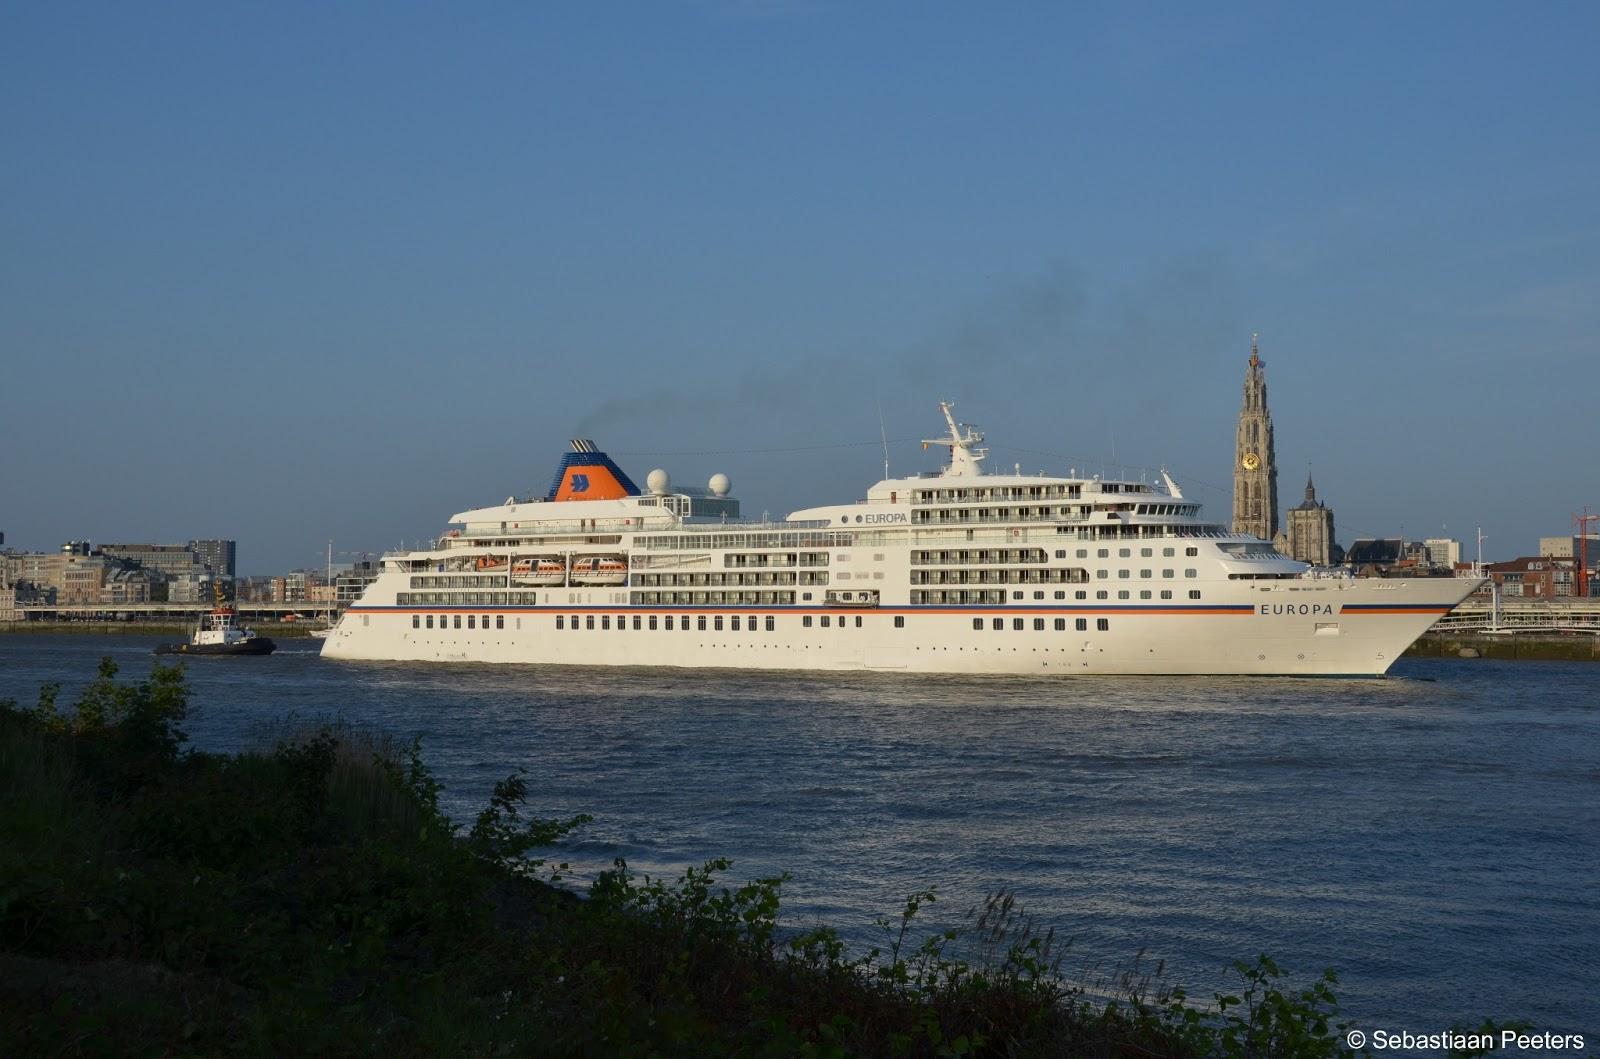 Cruiseschepen in antwerpen europa in antwerpen europa 39 s beste - Beste architektur uni europa ...